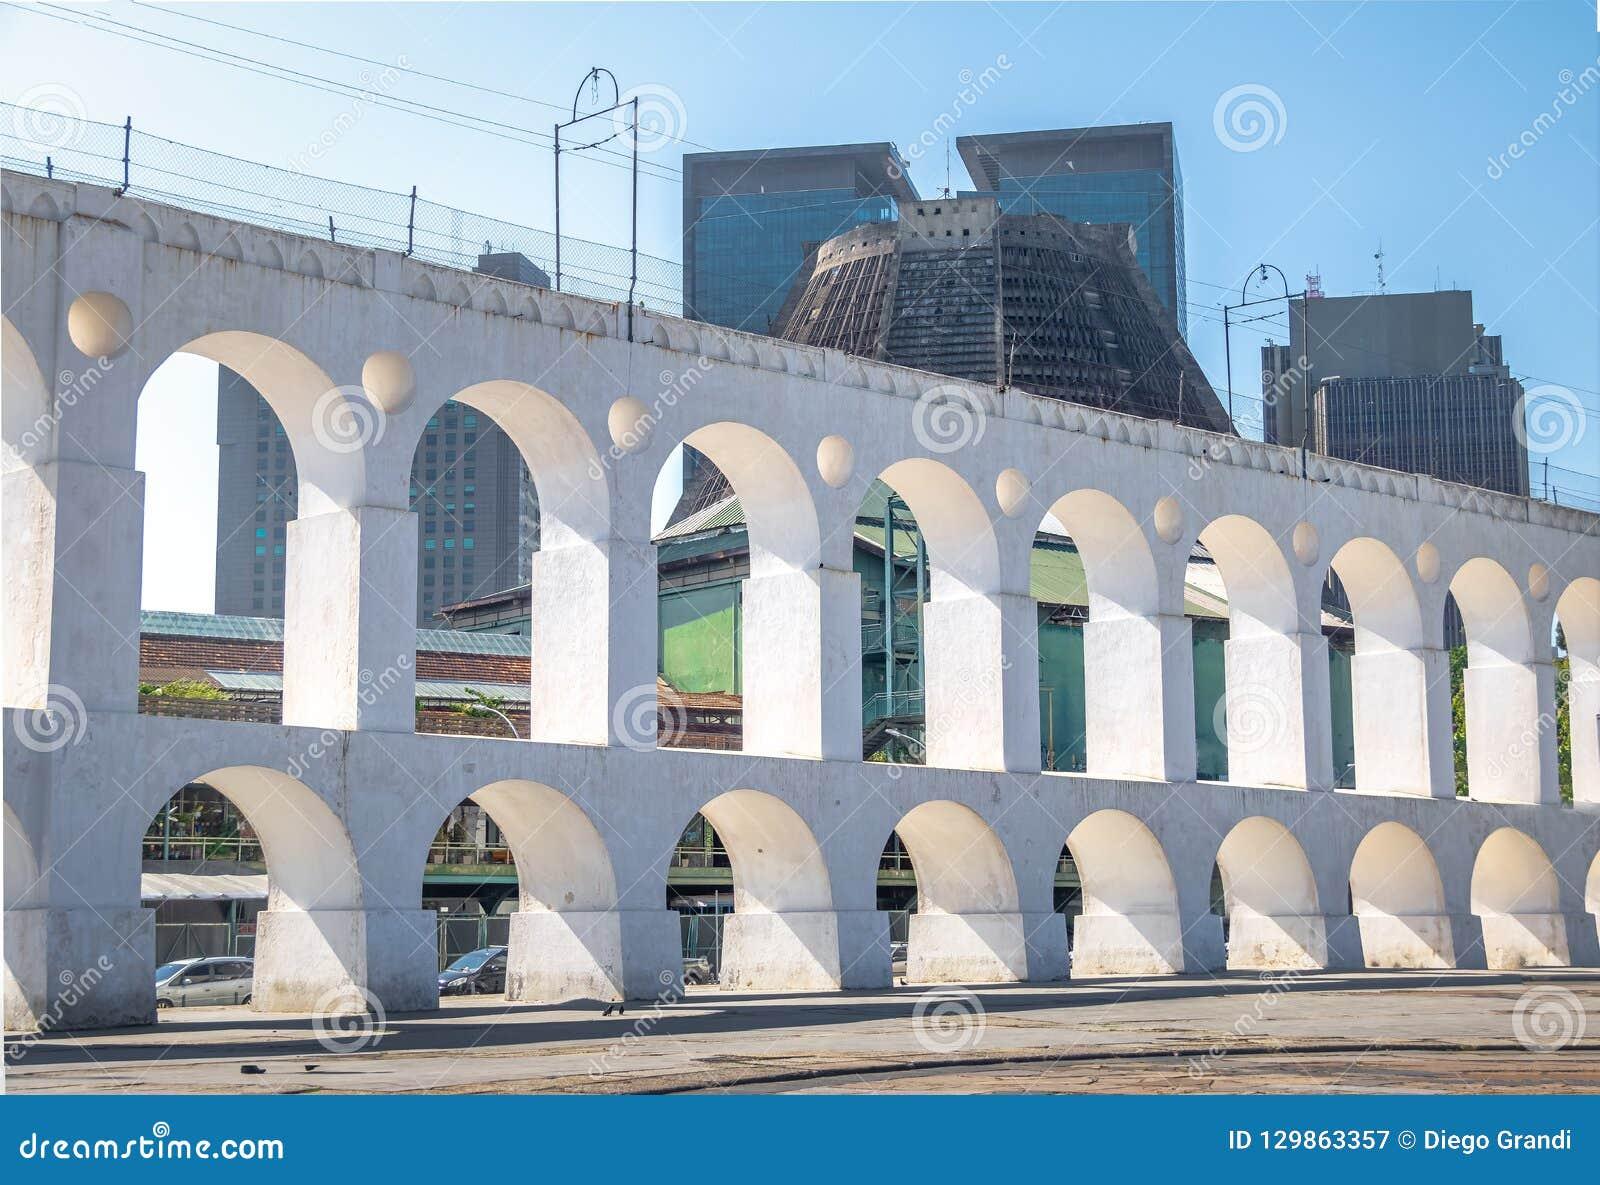 Arcos y catedral metropolitana - Rio de Janeiro, el Brasil de Arcos DA Lapa